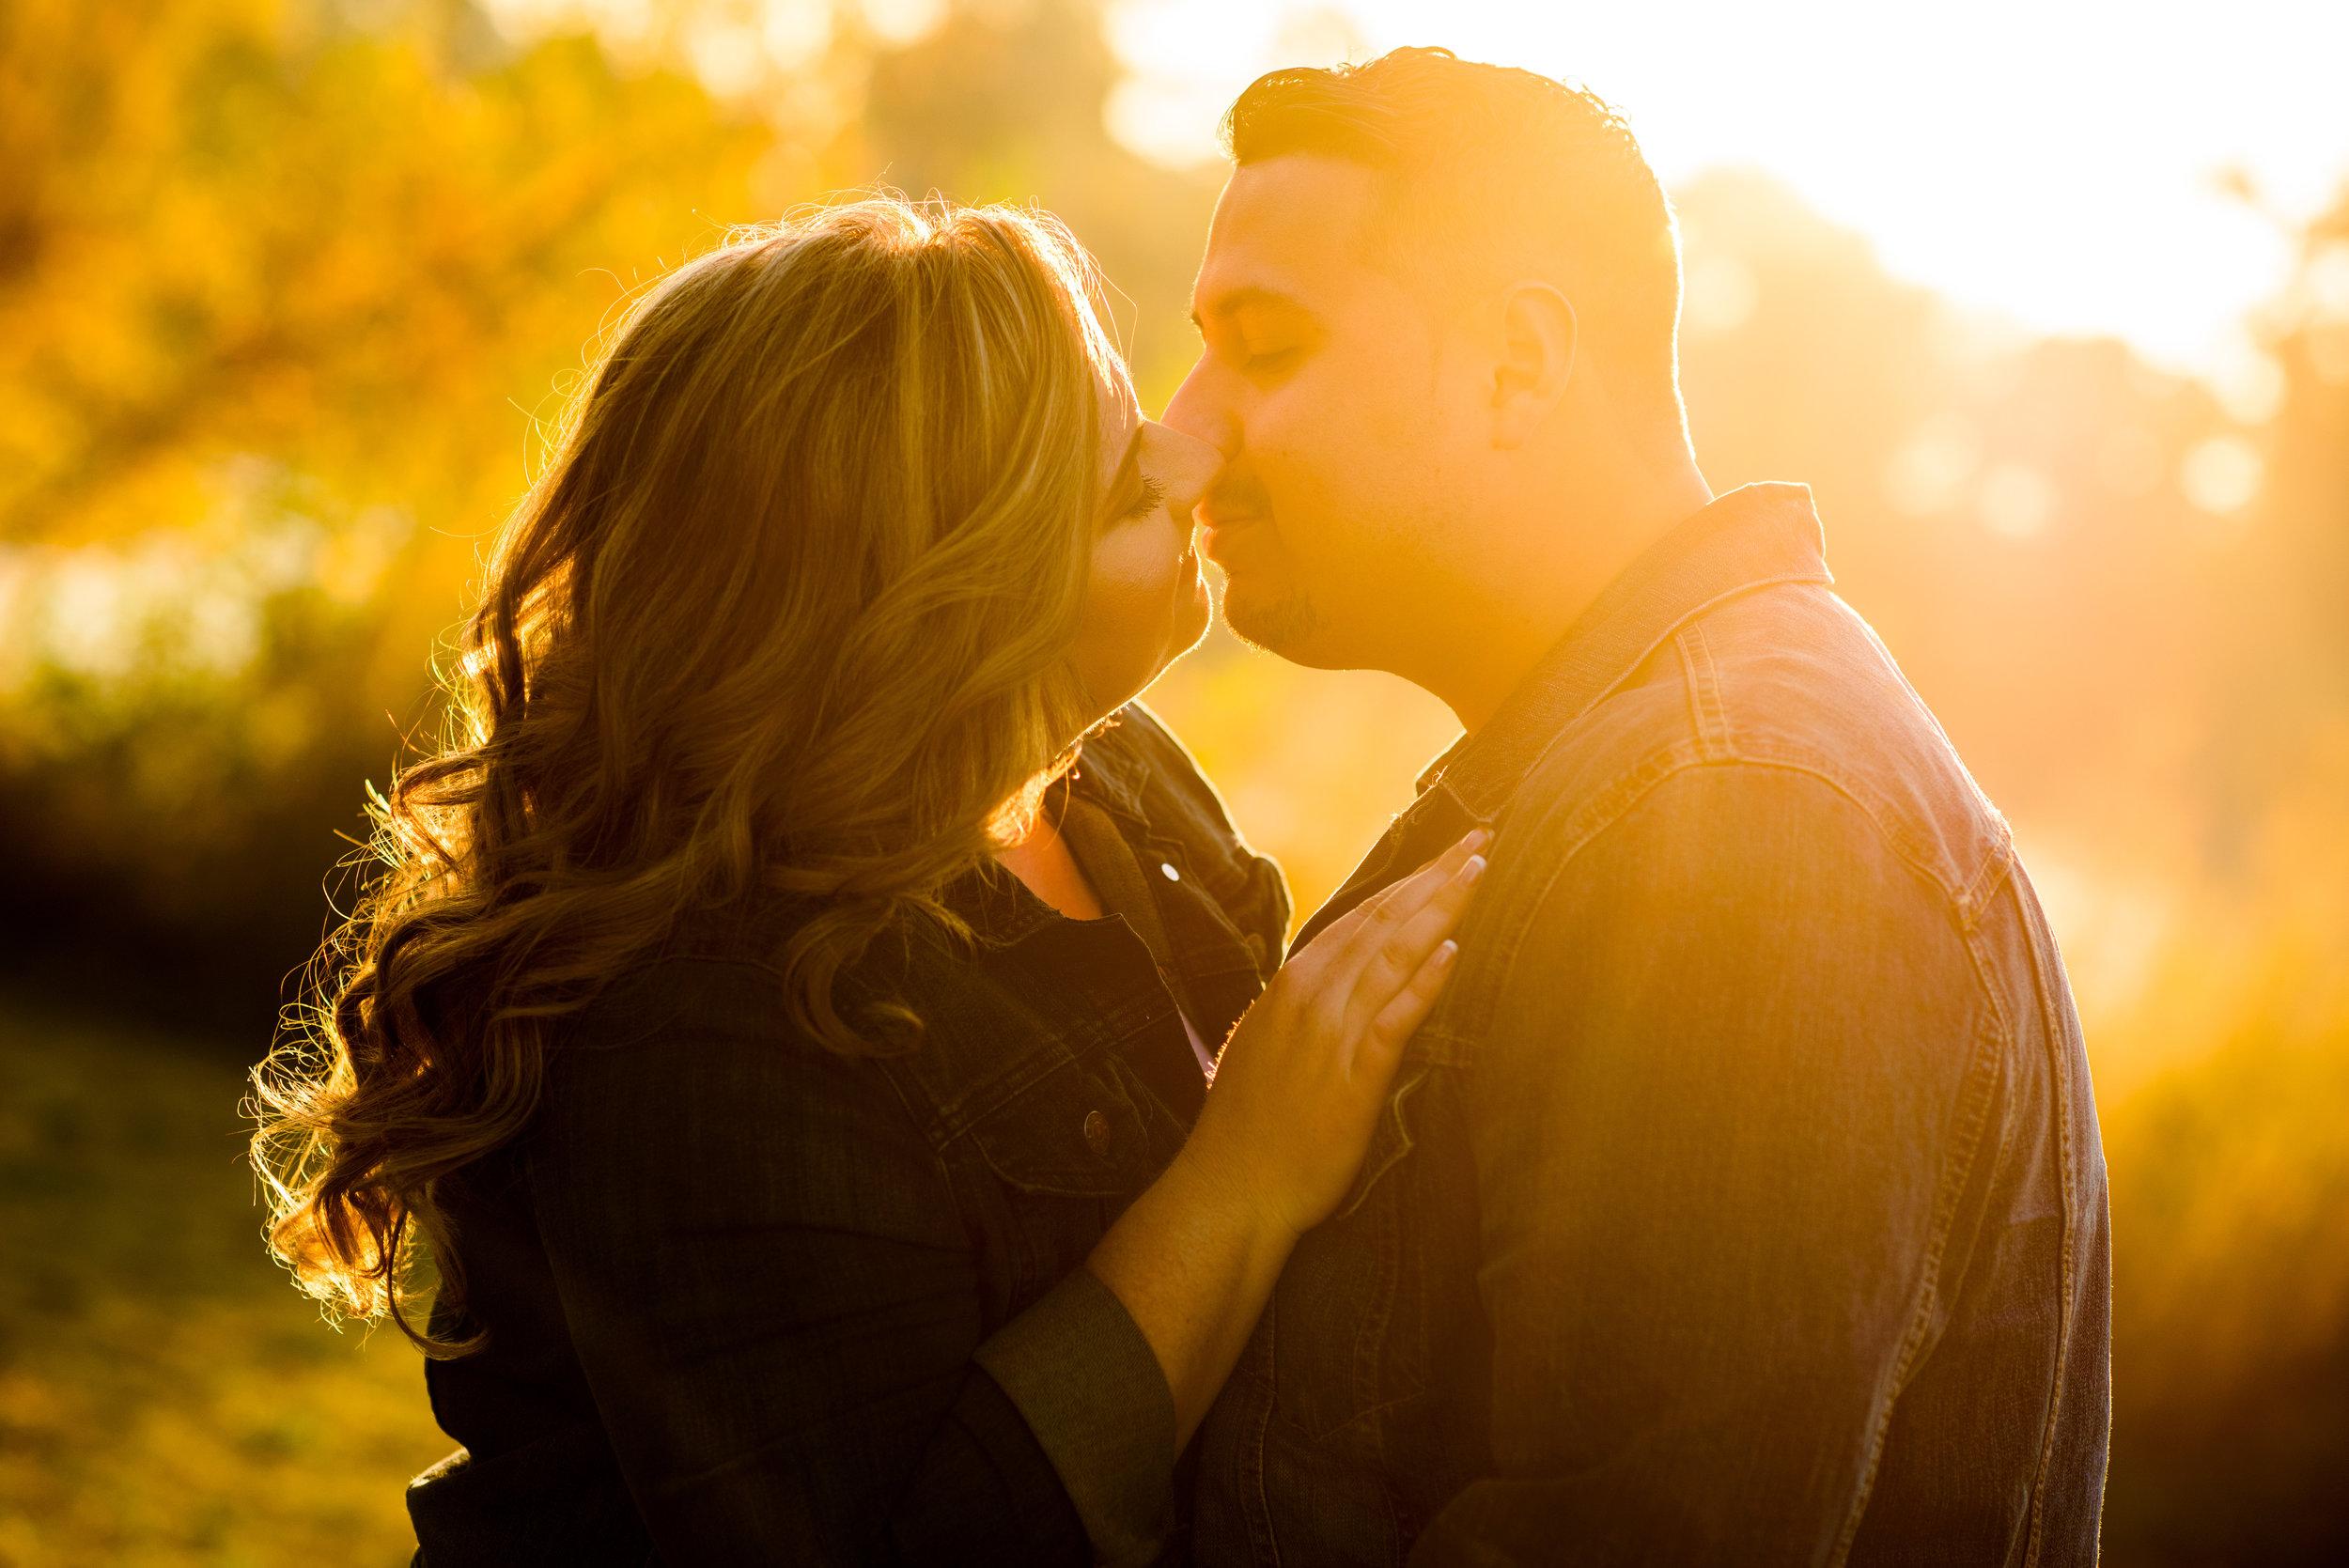 lynzie-javier-010-sacramento-california-engagement-wedding-photographer-katherine-nicole-photography.JPG